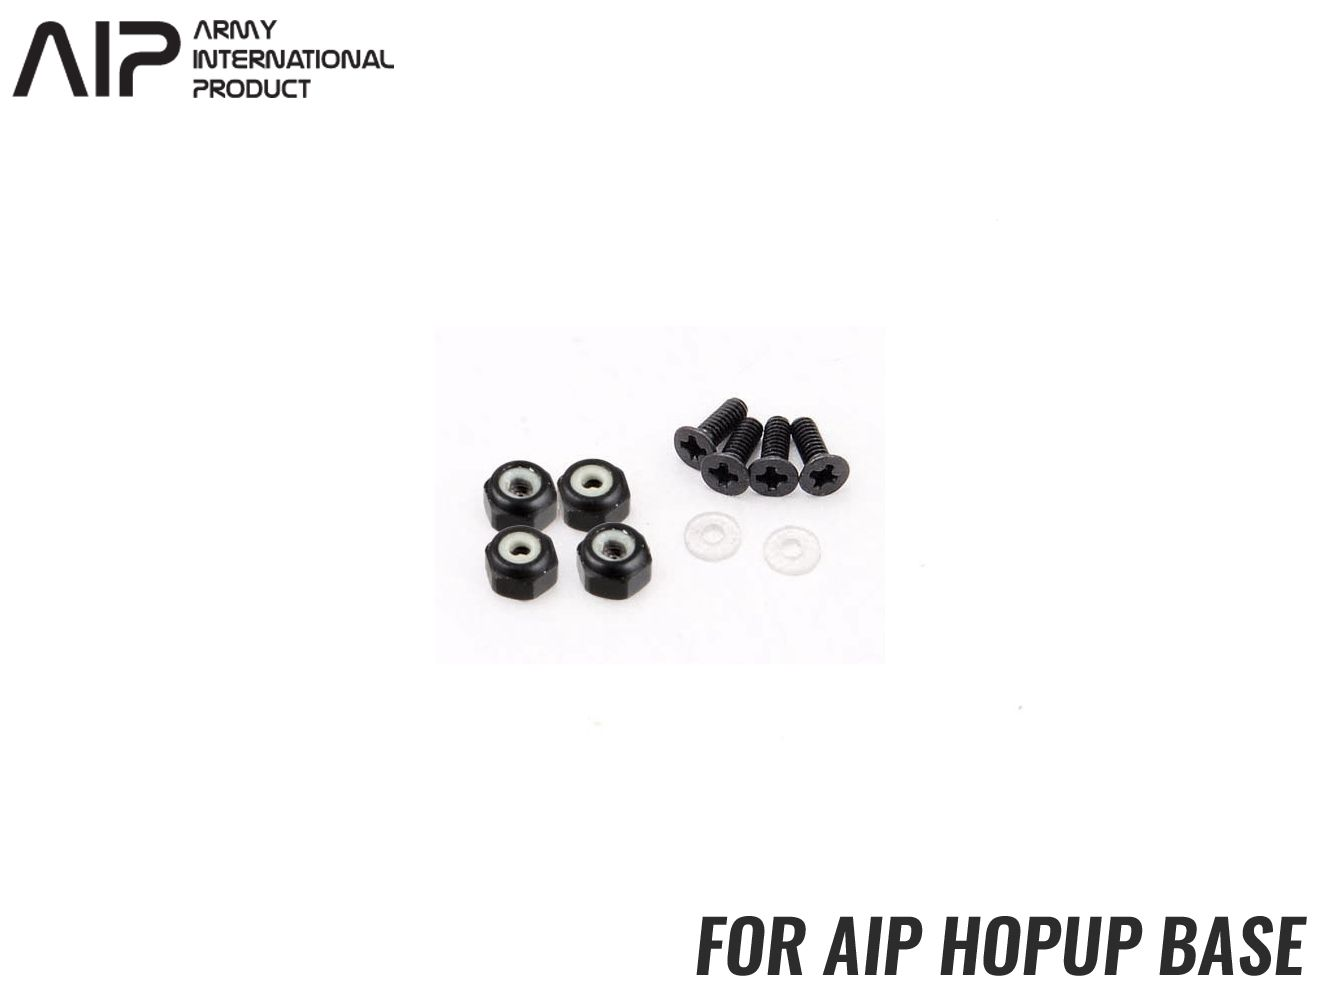 AIP 補修セット for AIP Hi-CAPA ホップアップベース◆AIP製ハイキャパ用 ホップアップベース対応 Oリングはマルイ ハイキャパにも使用可